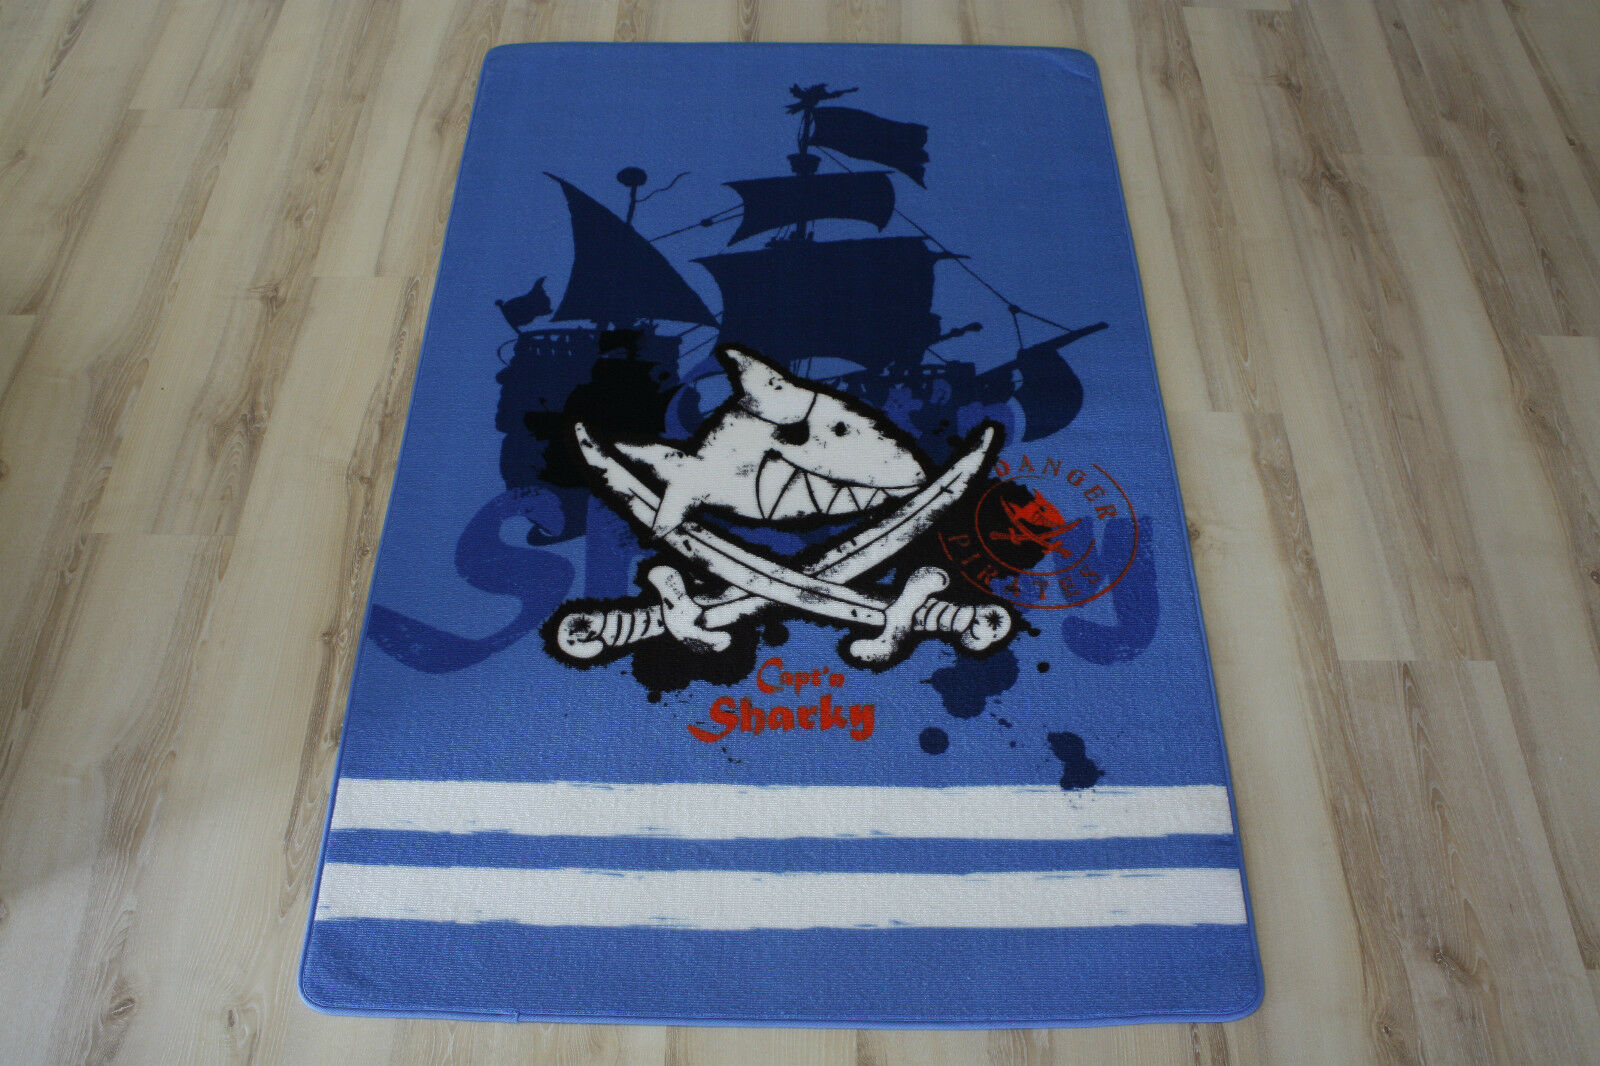 Eu 'N sharky tapis sh-305 140x200 cm Nouveau